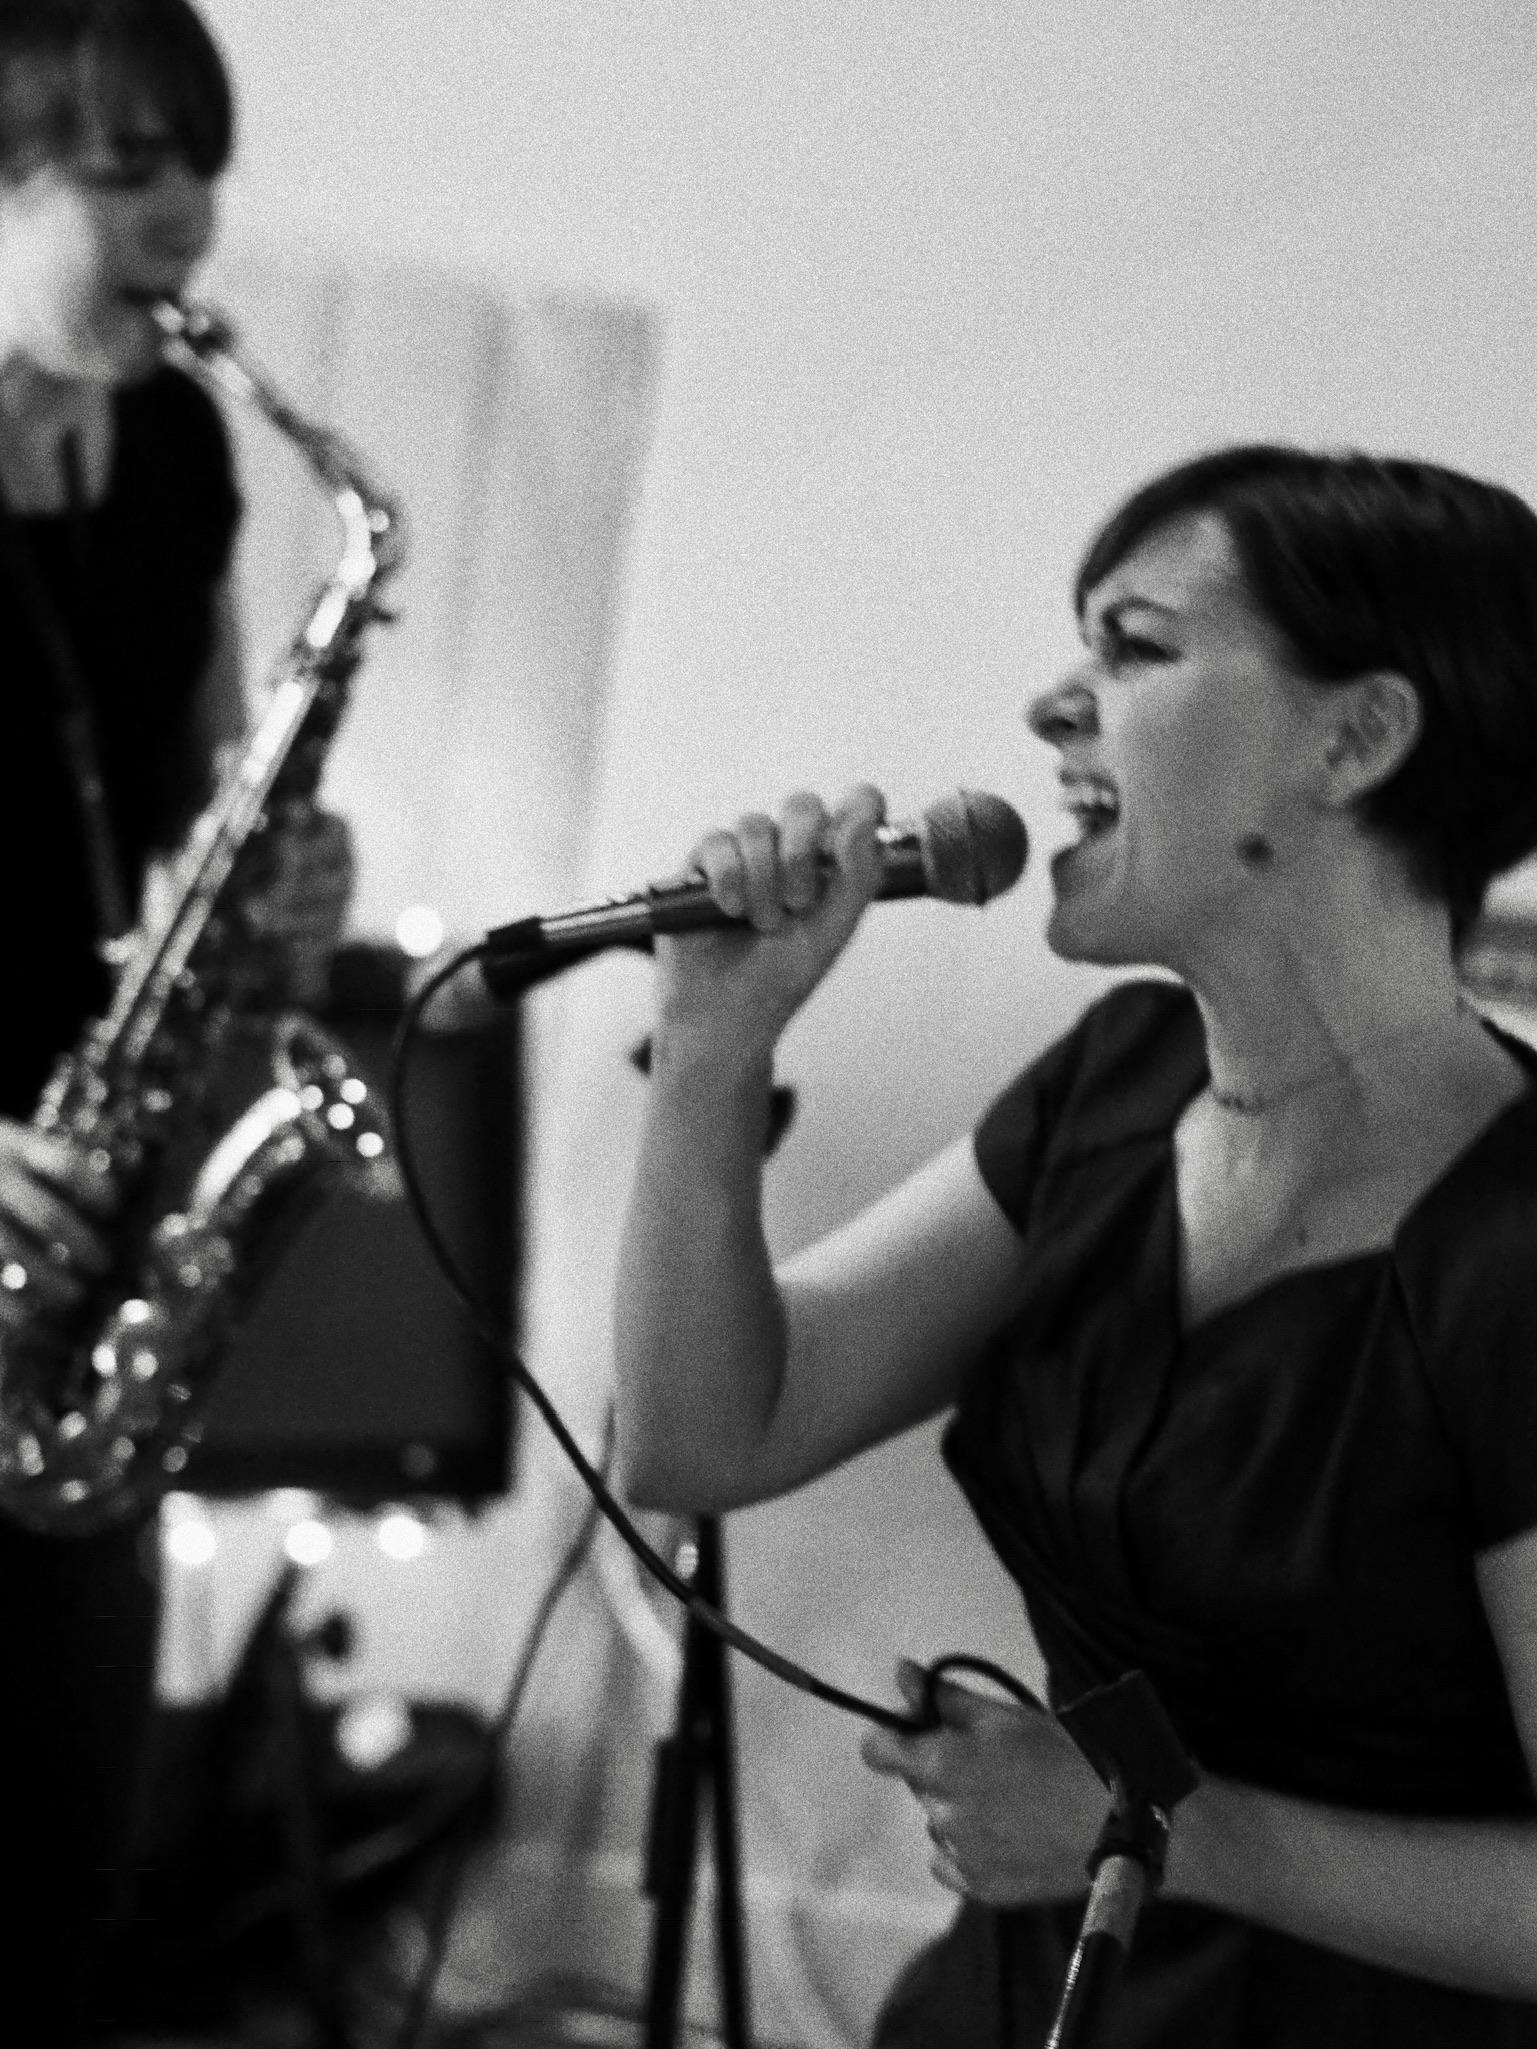 Music - NC Triangle and Beyondhttps://drowninglovers.bandcamp.com/https://katharinewhalenmusic.bandcamp.com/album/swedish-wood-patrolhttp://felixobelix.com/https://batfangs.bandcamp.com/releaseshttps://caverntavern.com/http://www.nightlightclub.com/https://catscradle.com/https://www.facebook.com/kingstreetbarKSB/https://www.arcanadurham.com/#homehttp://local506.com/https://www.thepinhook.com/http://neptunesparlour.com/